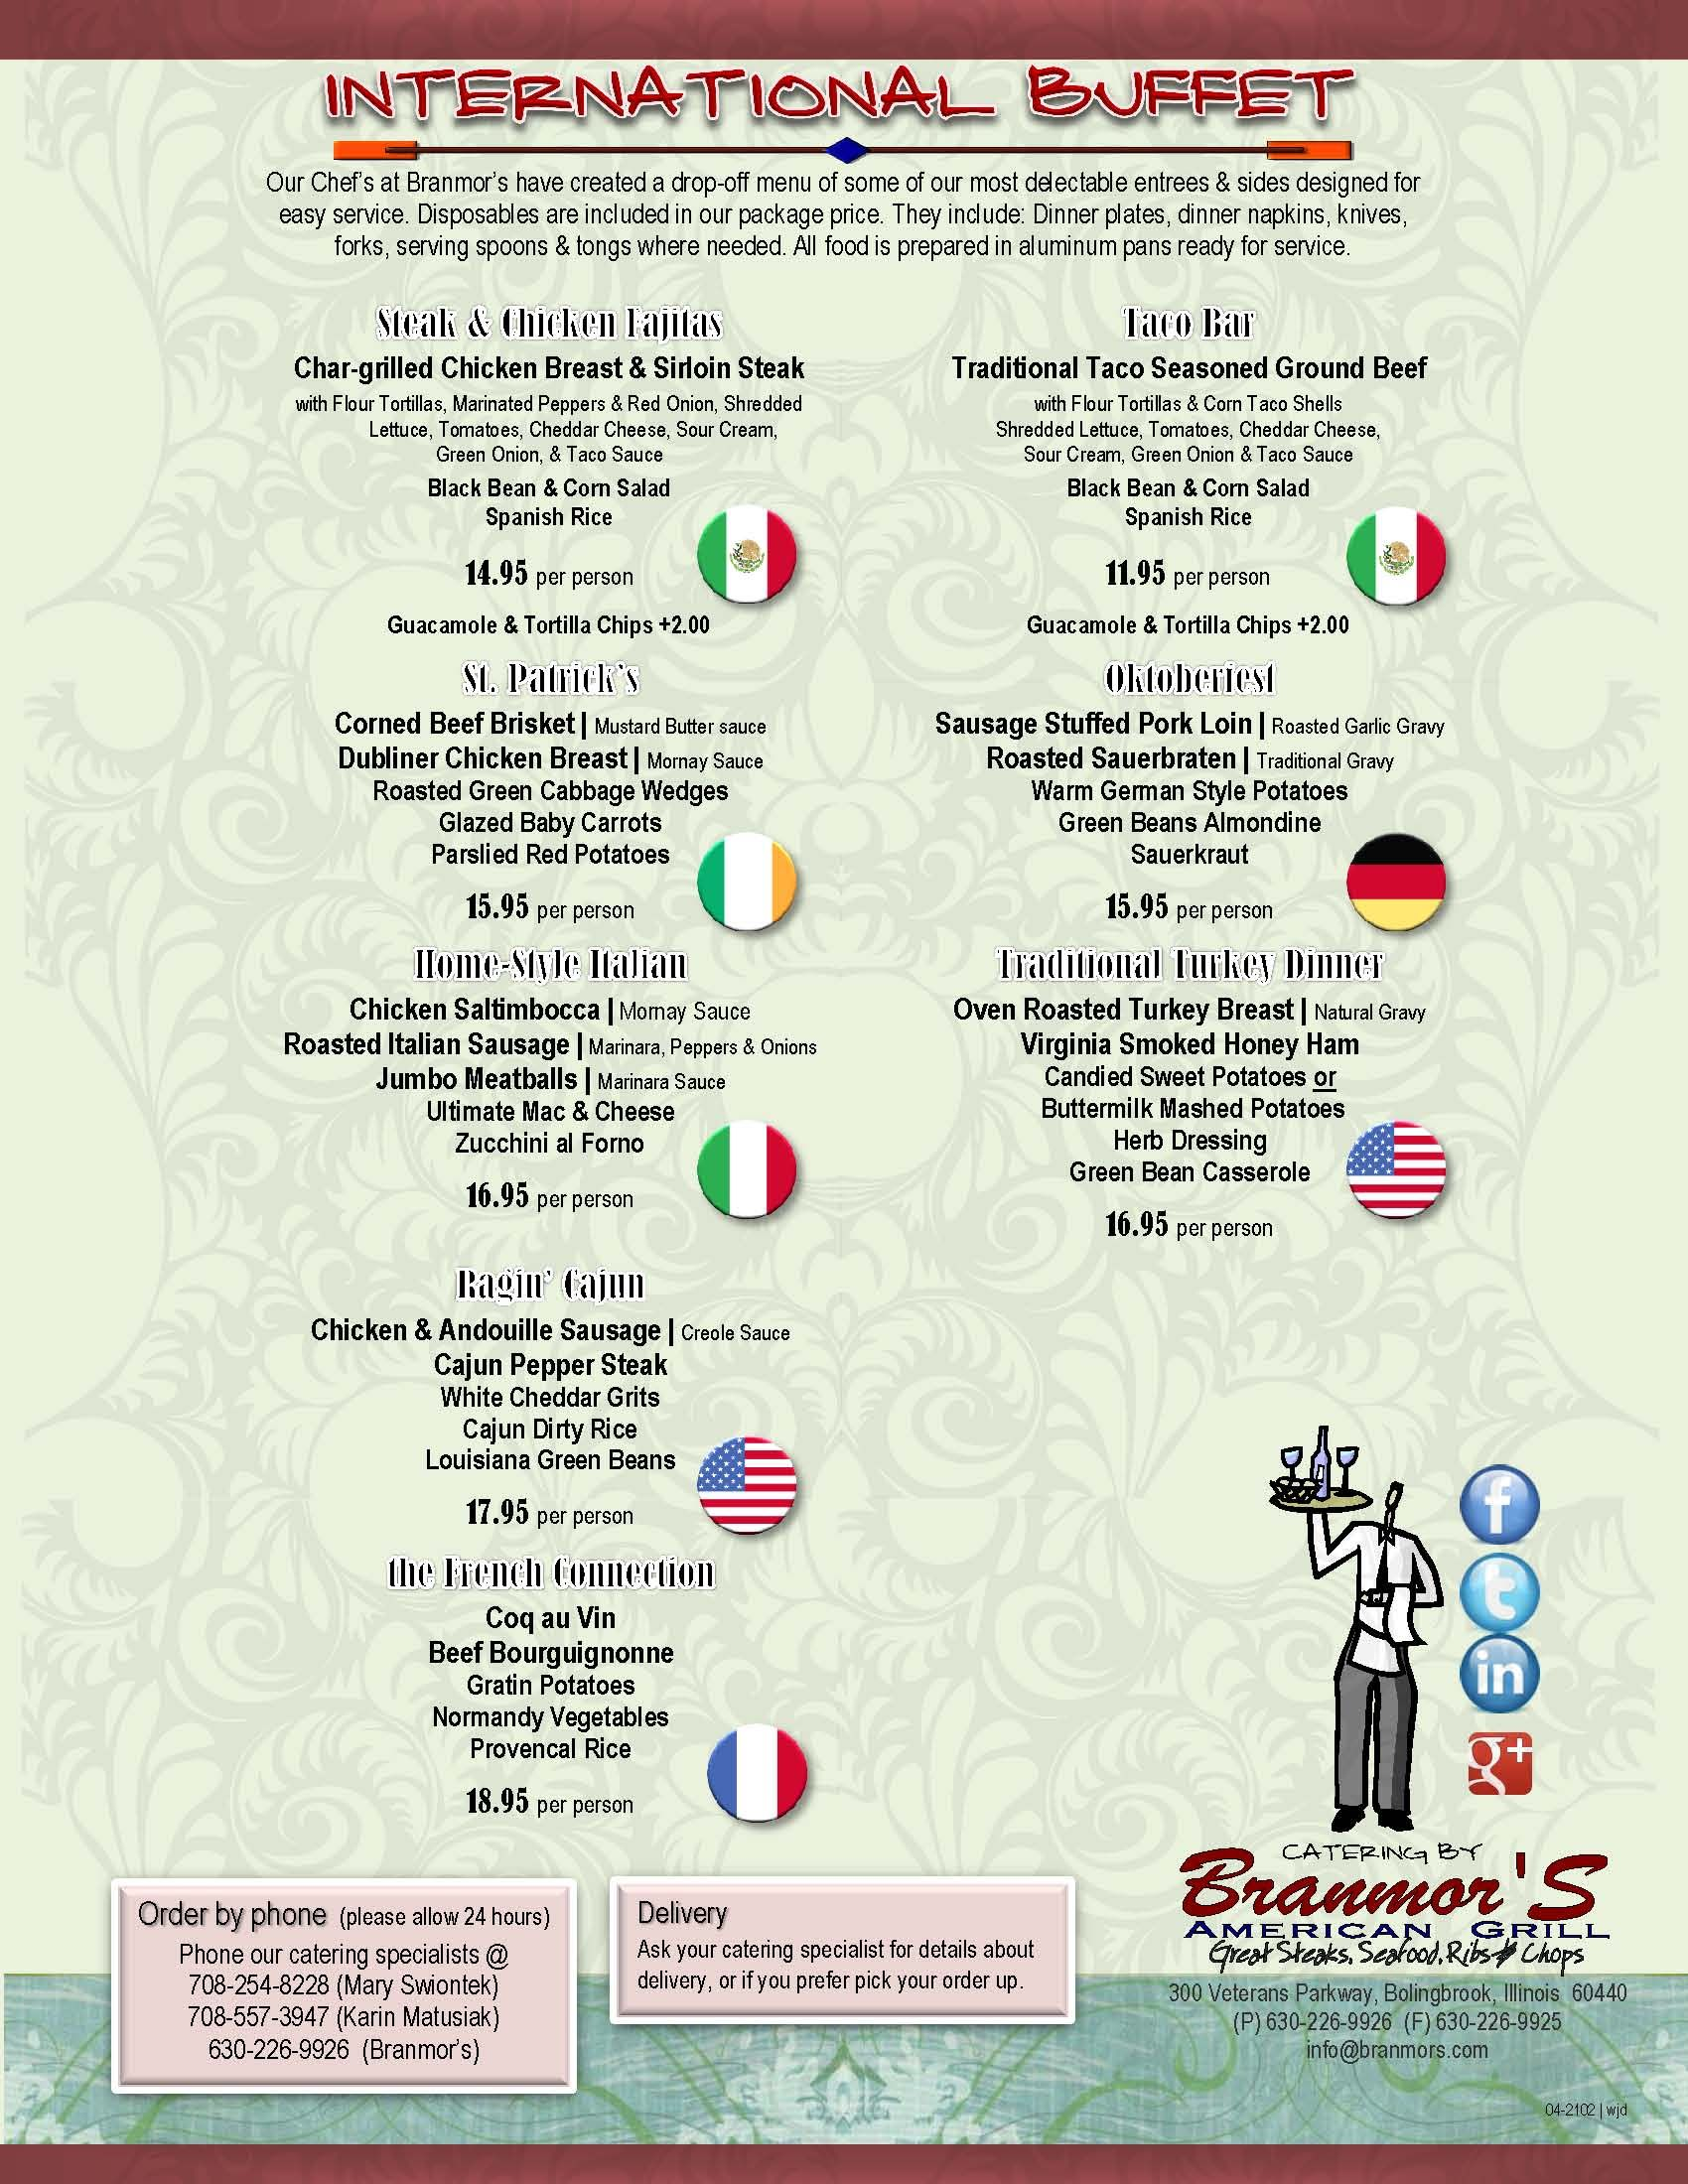 Pleasant 2012 Catering Menu International Buffet Branmors Download Free Architecture Designs Photstoregrimeyleaguecom